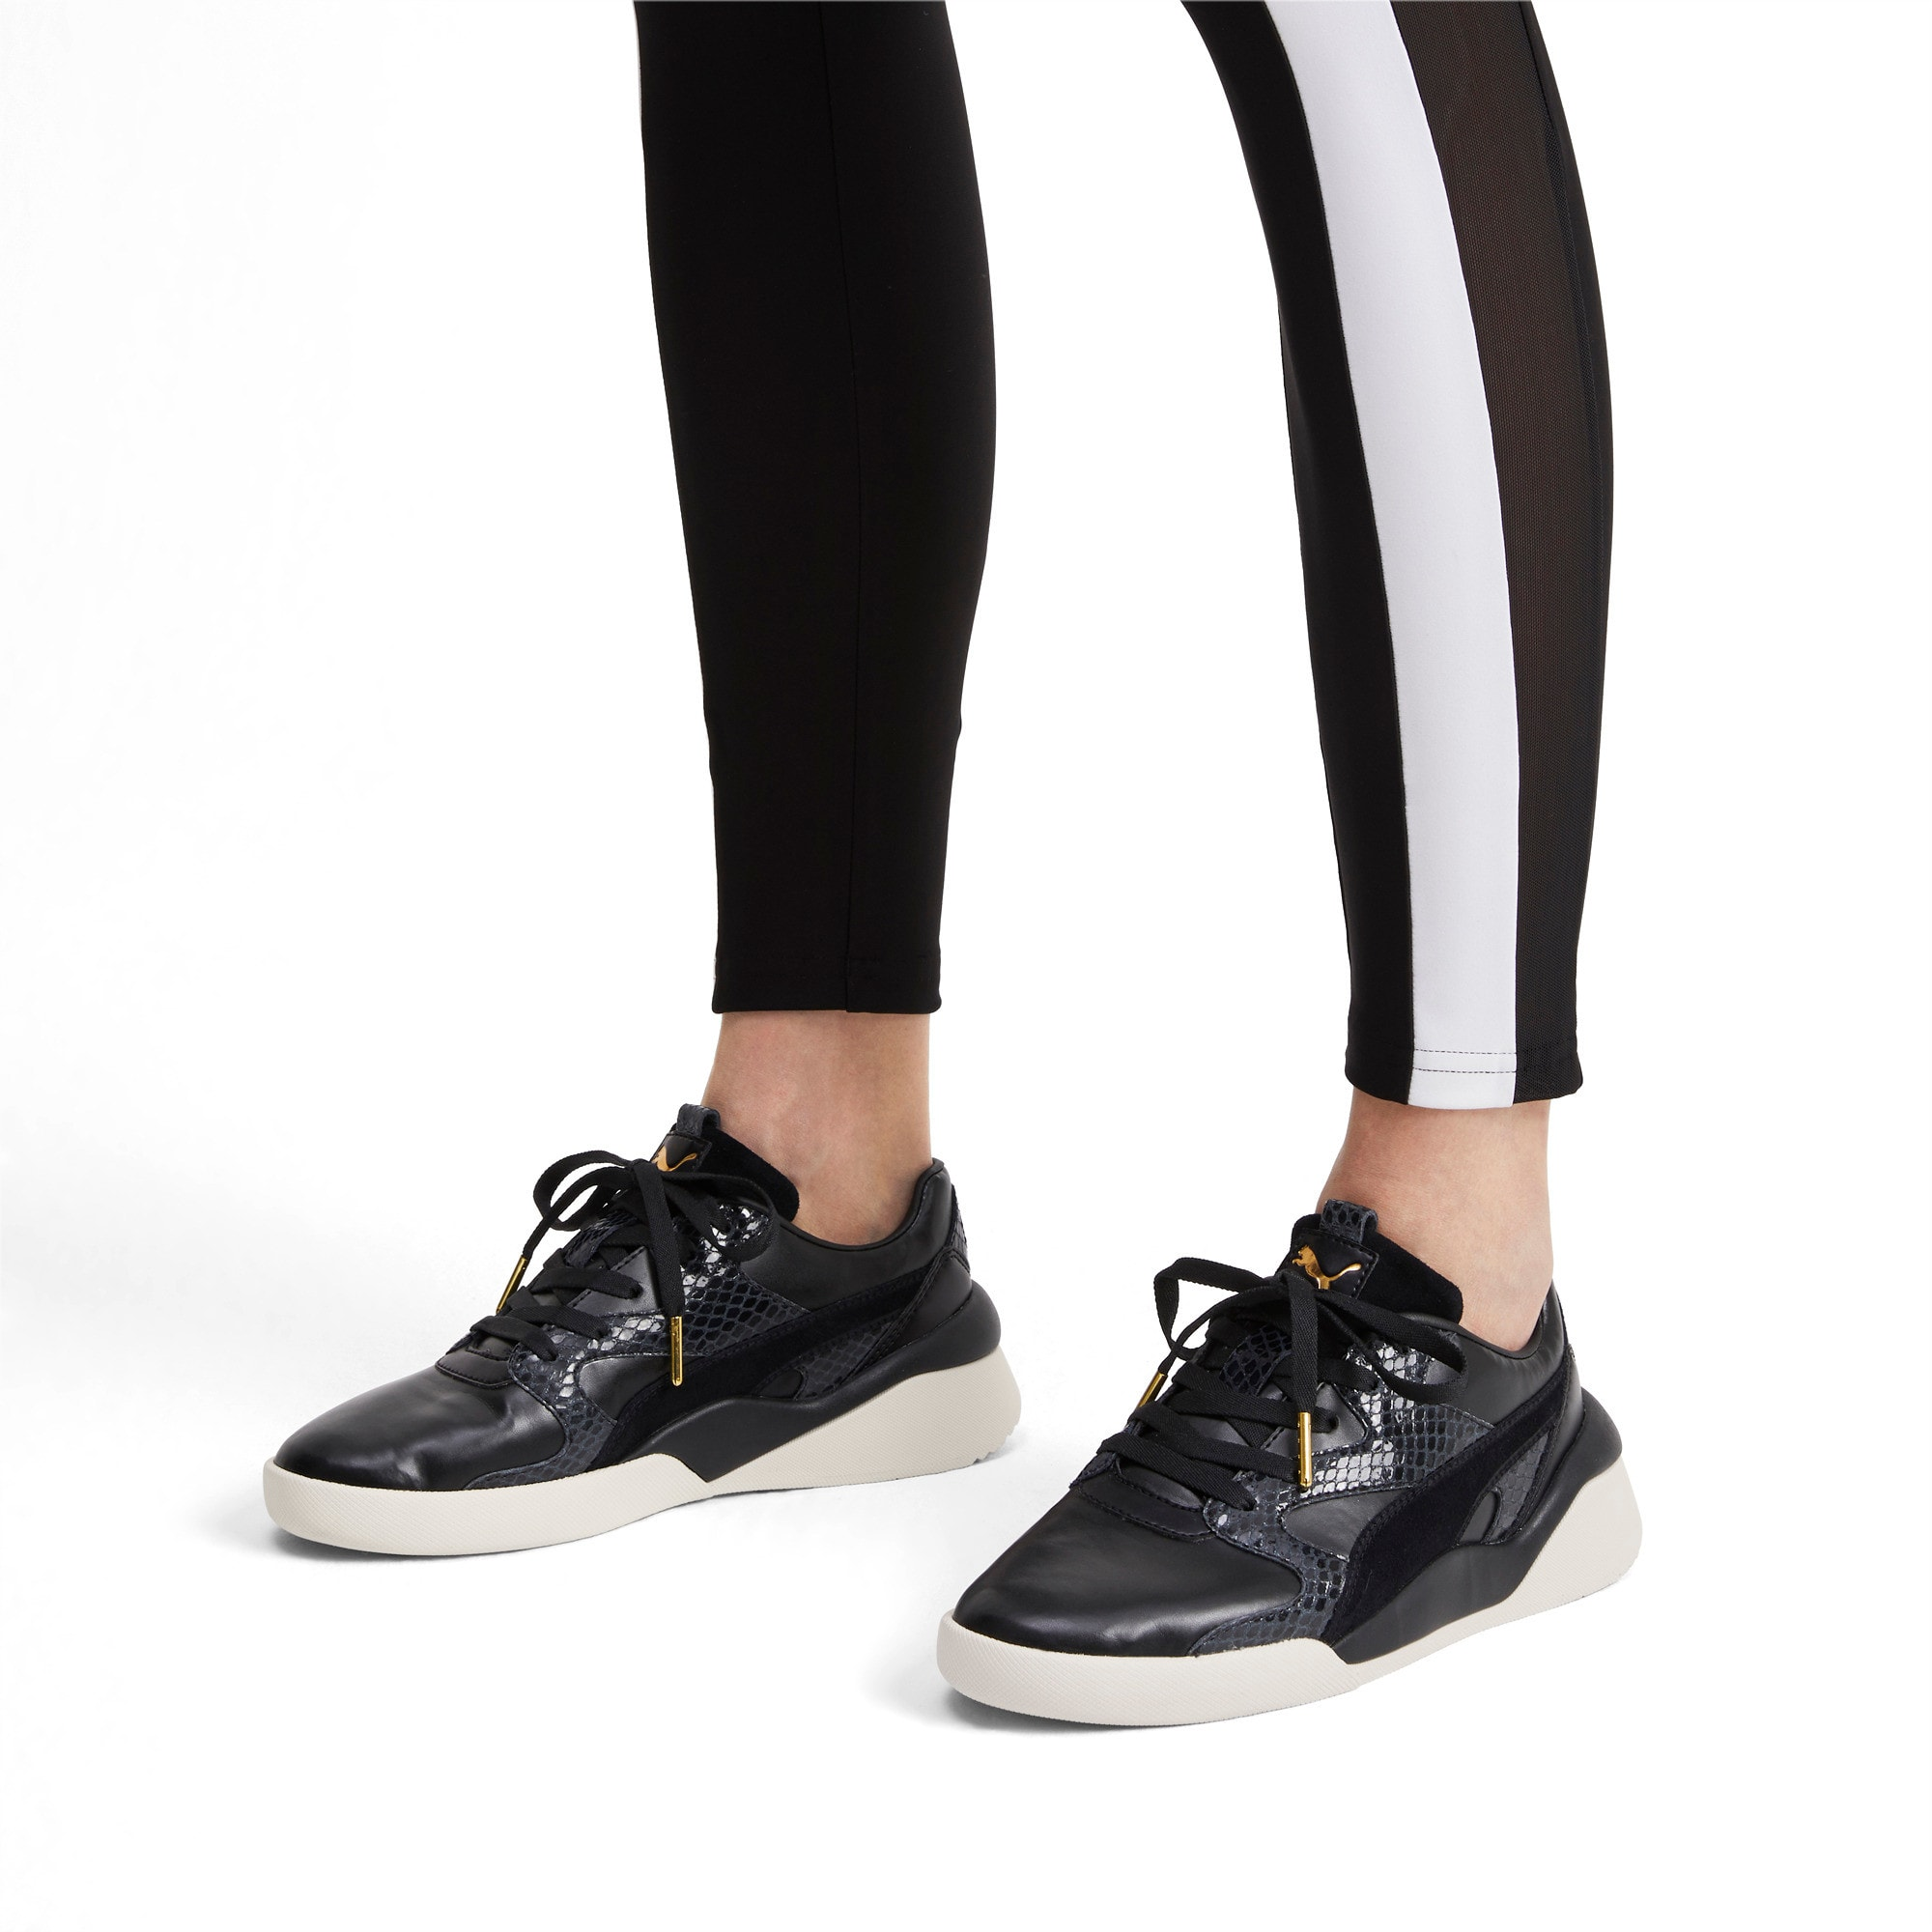 Thumbnail 2 of Aeon Play Women's Sneakers, Puma Black, medium